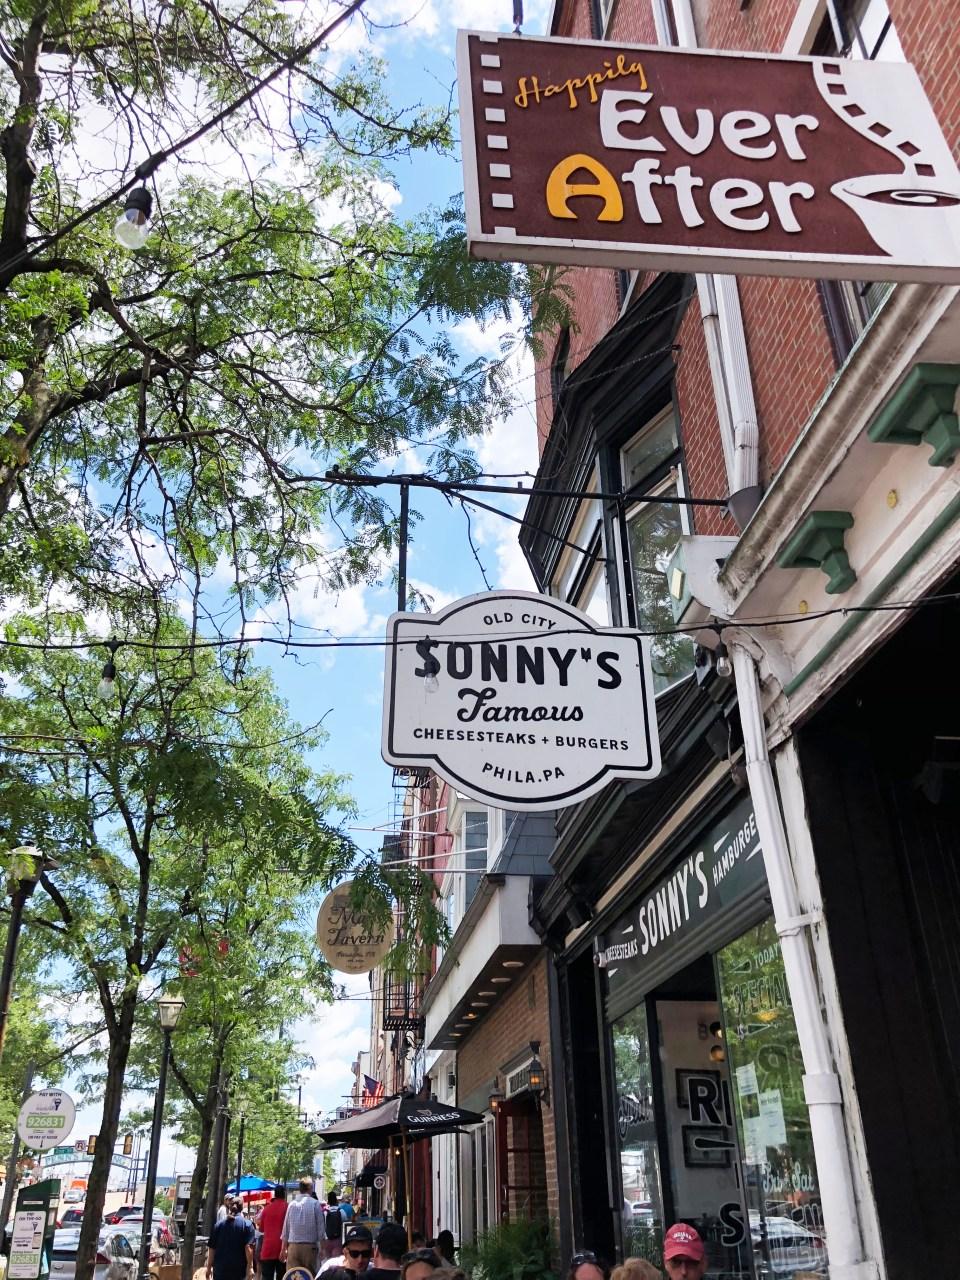 Sonny's Famous Cheesesteaks